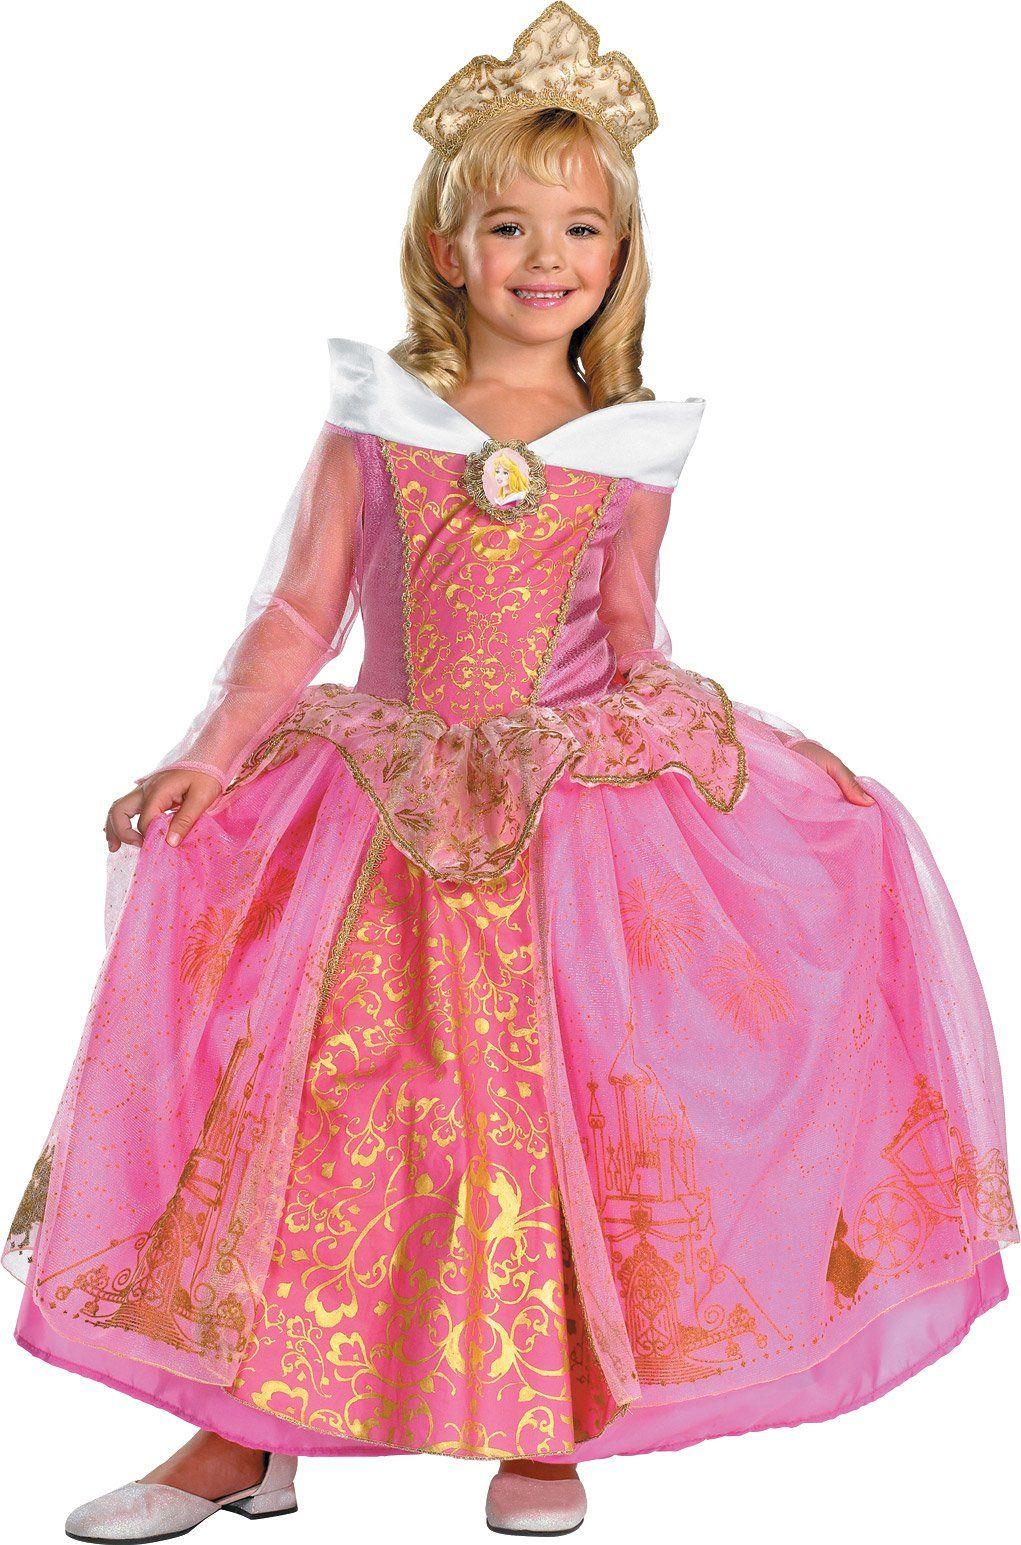 Disney Storybook Aurora Prestige Toddler / Child Costume | Princesas ...